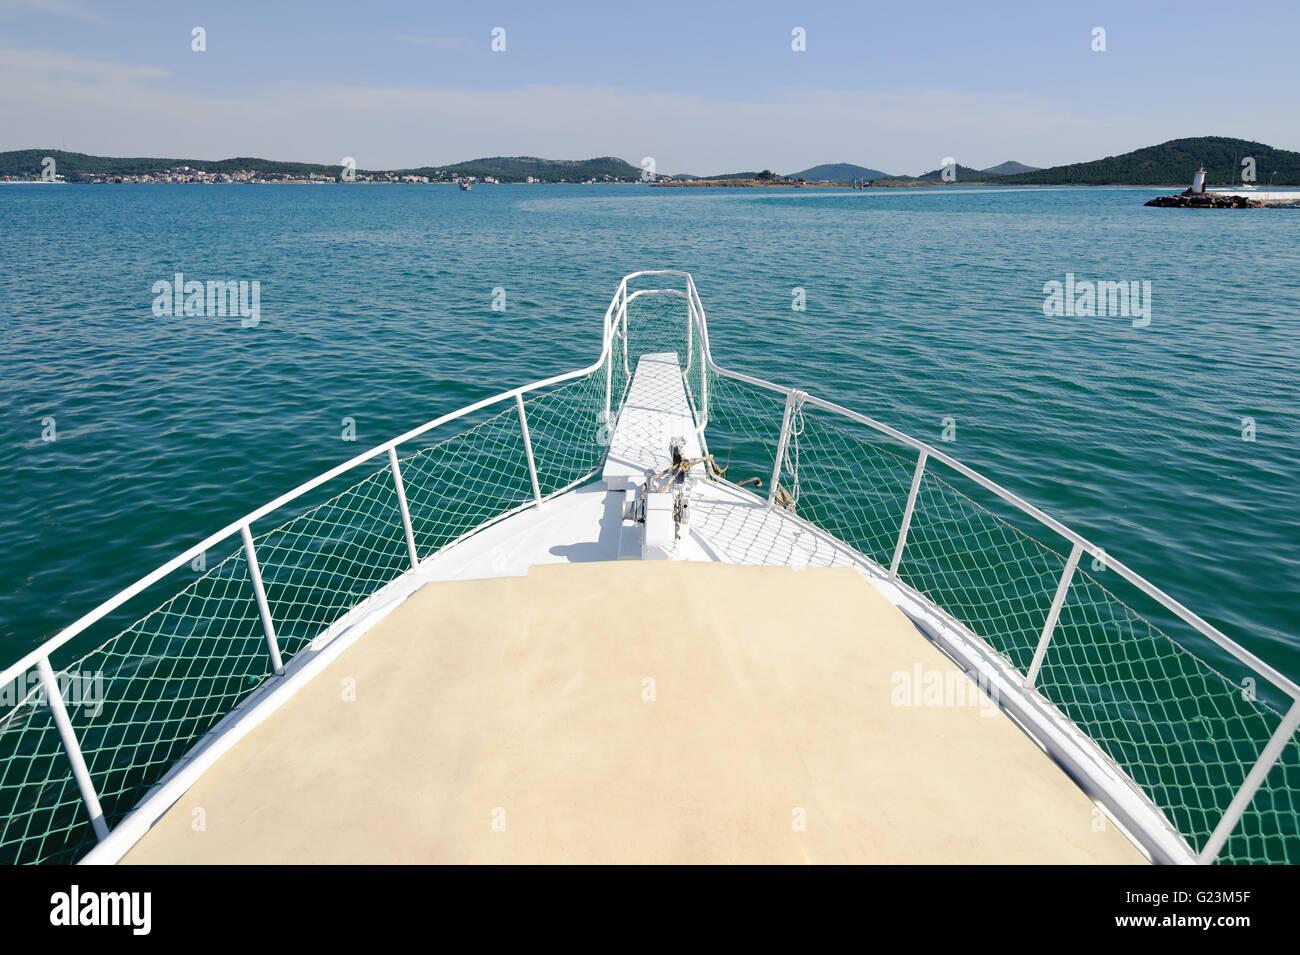 Yatch at blue tour on the sea in Alibey Cunda island Ayvalik Balikesir Turkey. - Stock Image